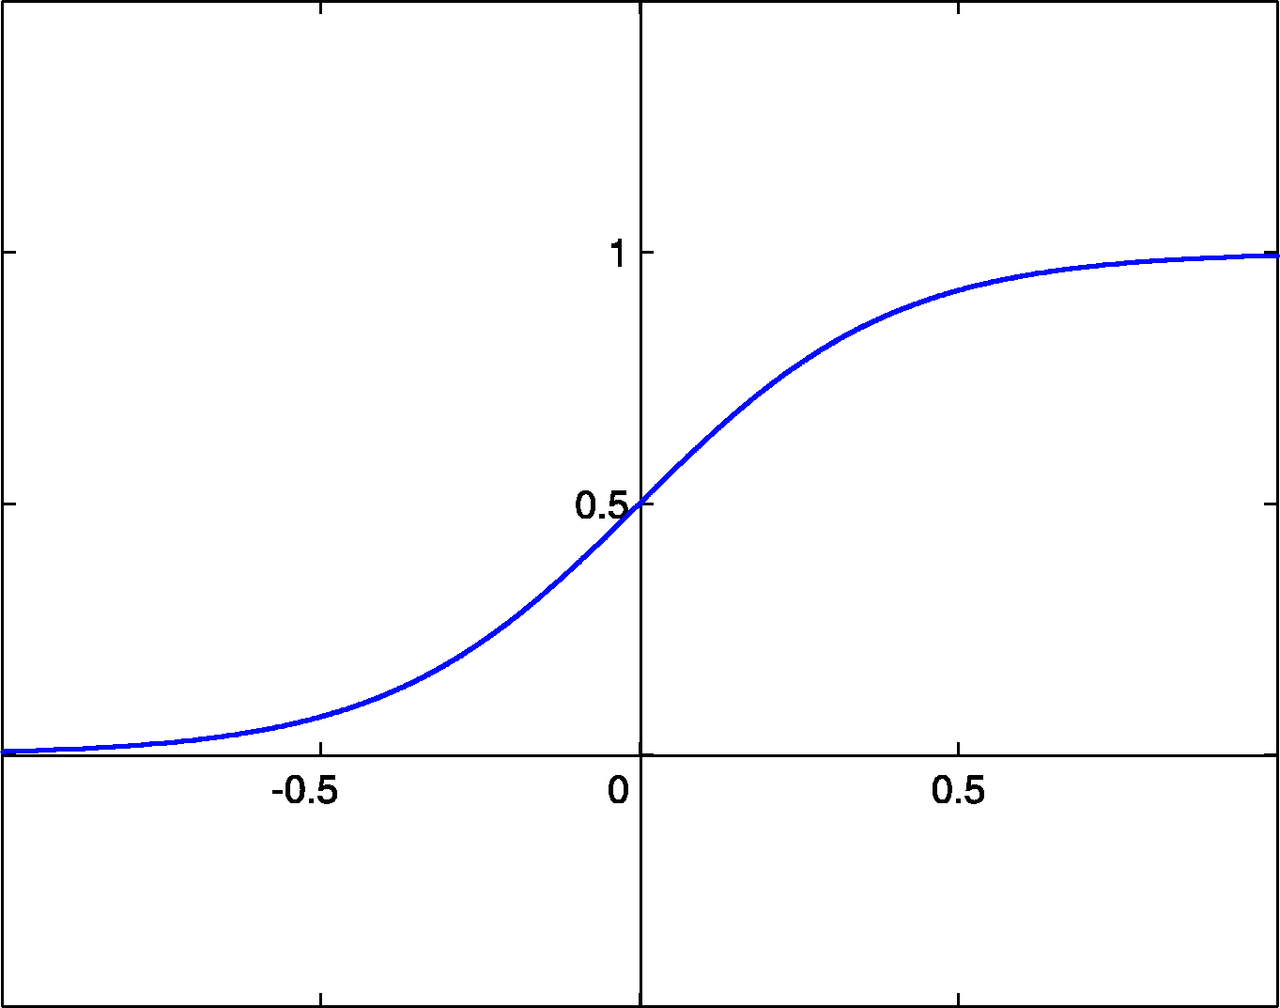 https://upload.wikimedia.org/wikipedia/commons/thumb/b/b5/SigmoidFunction.png/1280px-SigmoidFunction.png